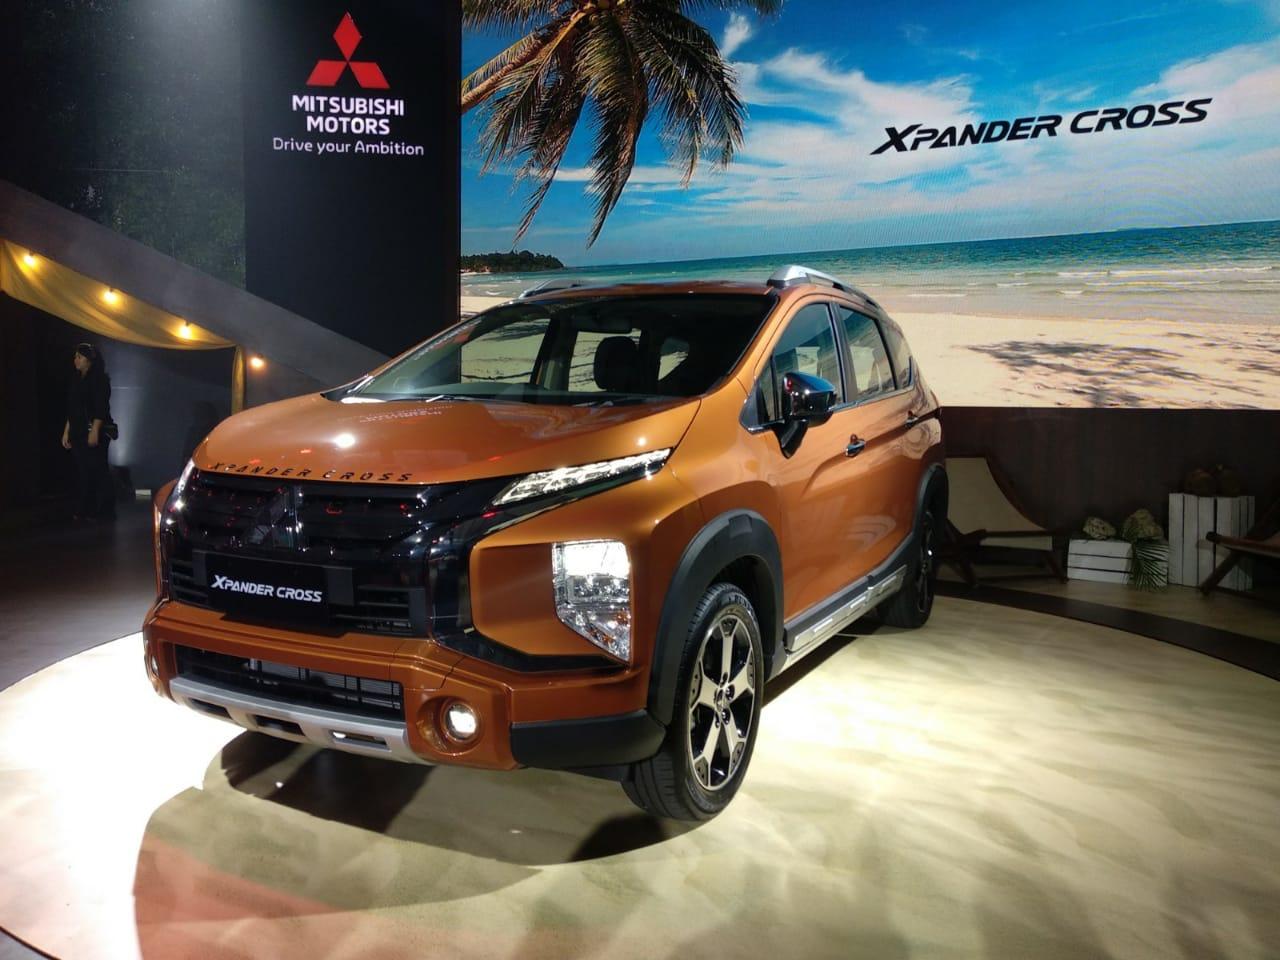 Kelebihan Xpander Cross Keluaran SUV Terbaru Mitsubishi Solo